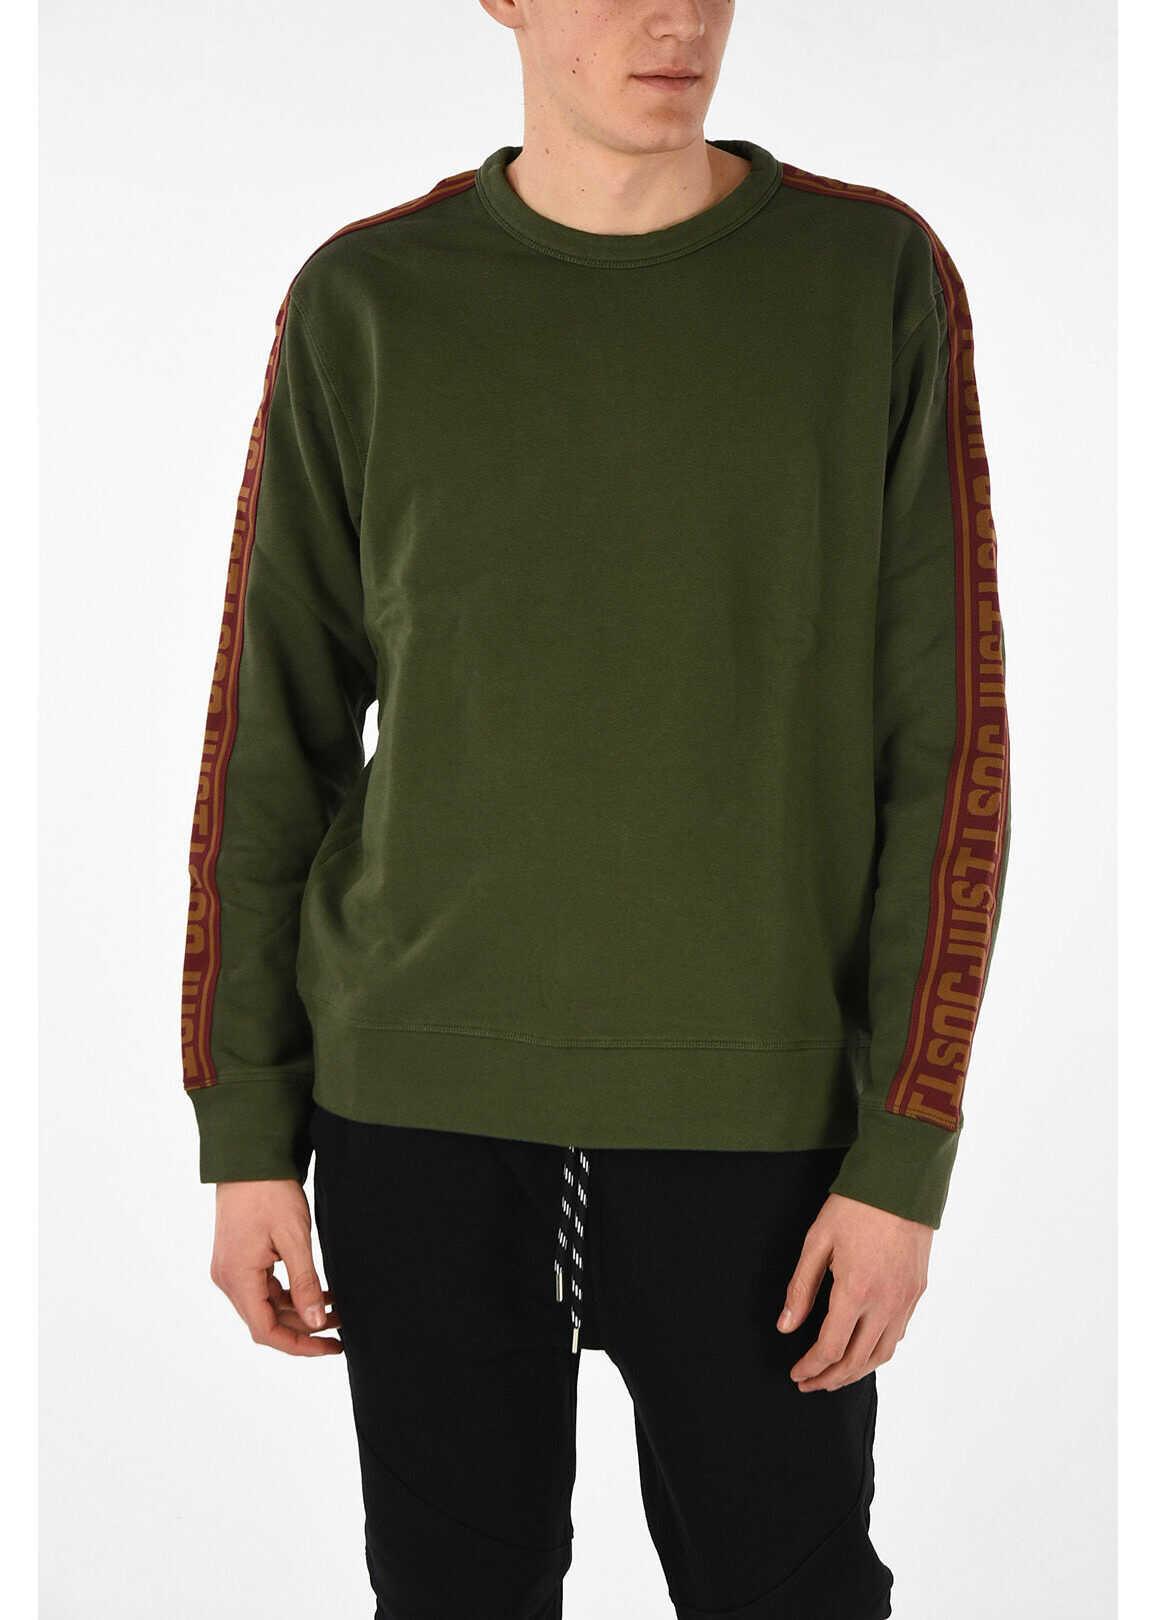 Just Cavalli Round Neck Sweater MILITARY GREEN imagine